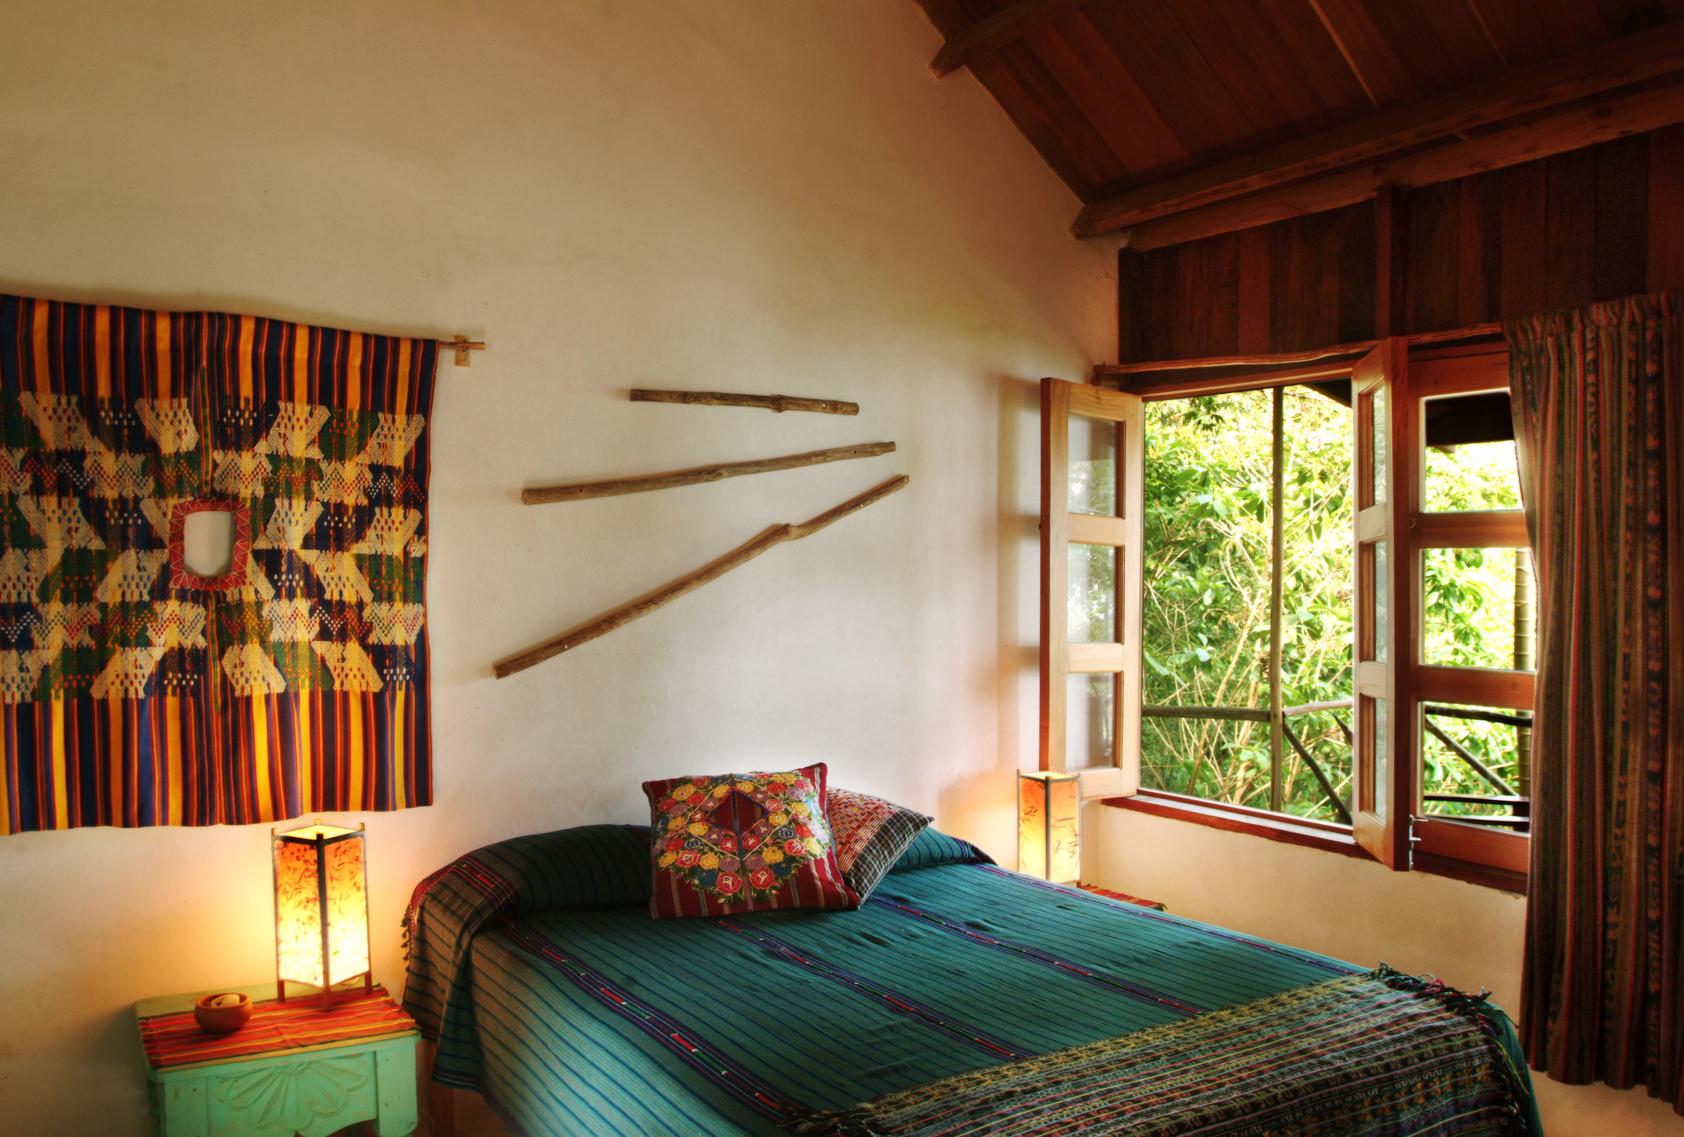 bed in Rainforest Casita at La Lancha